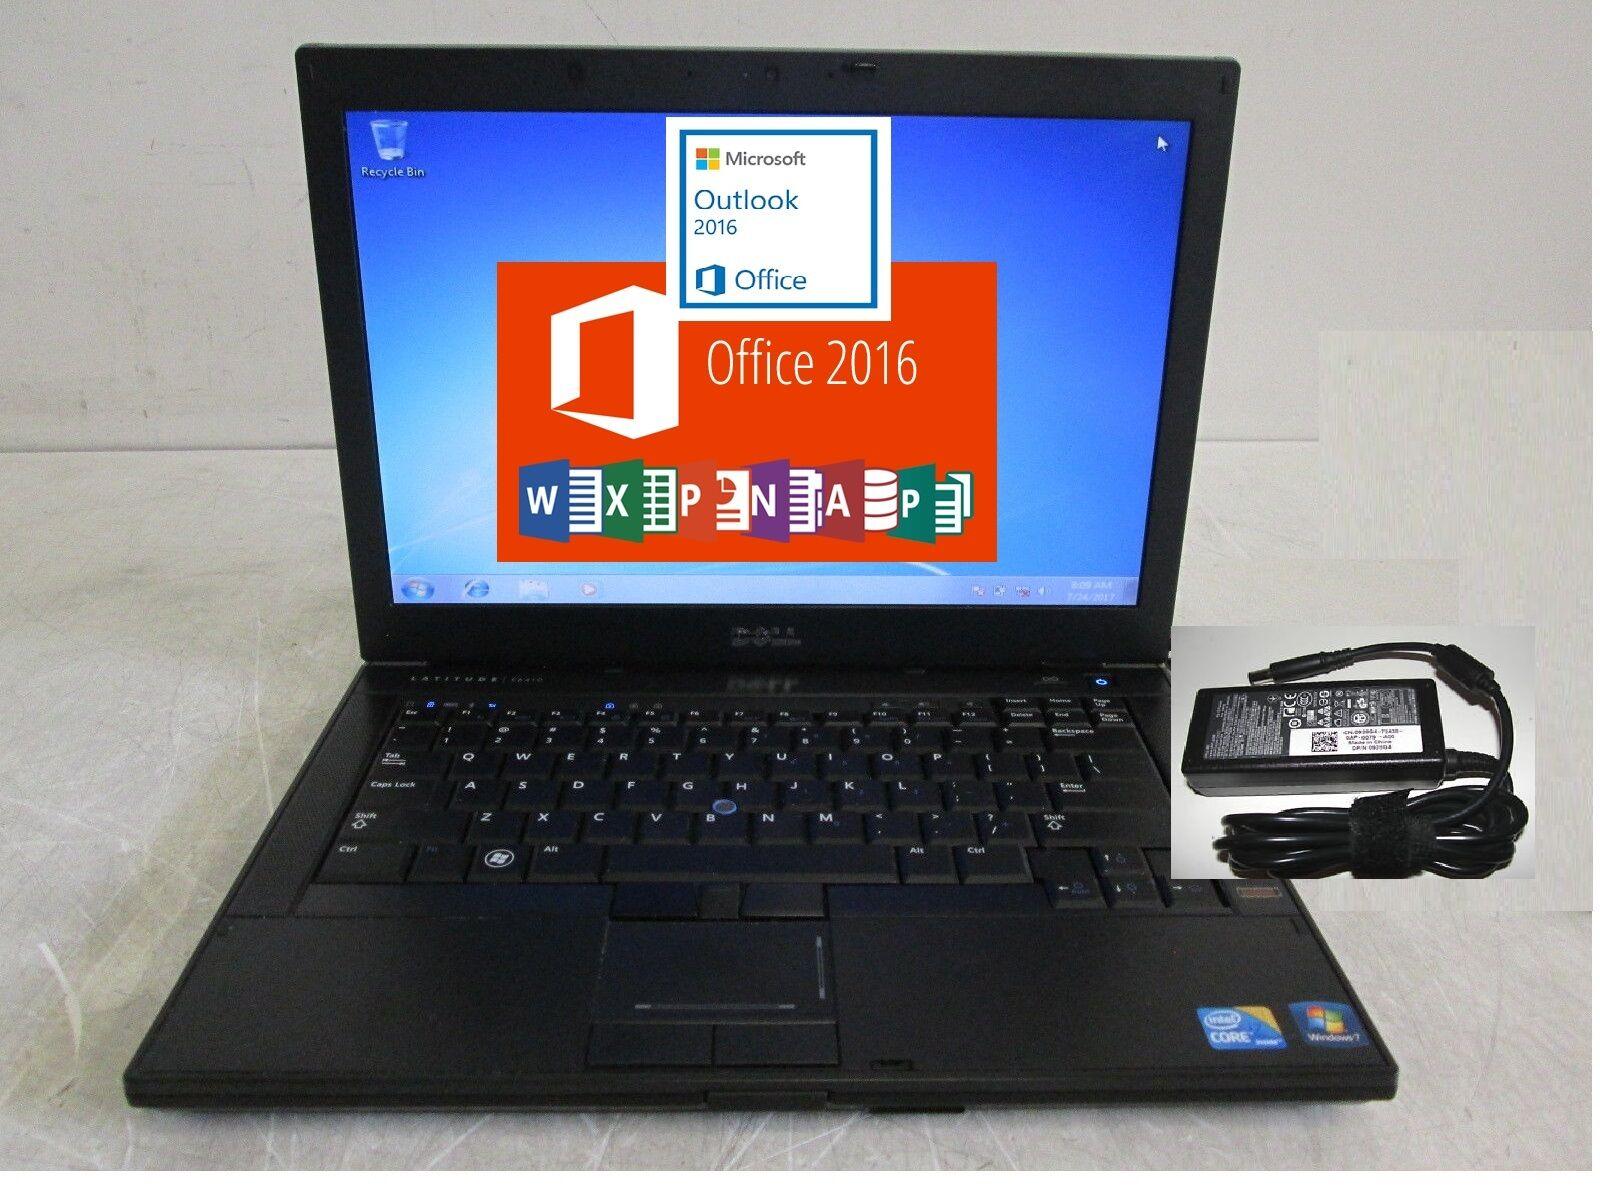 Dell Latitude Laptop. Intel Core i5 M520 2.67GHz 4GB Ram 120 GB SSD Drive